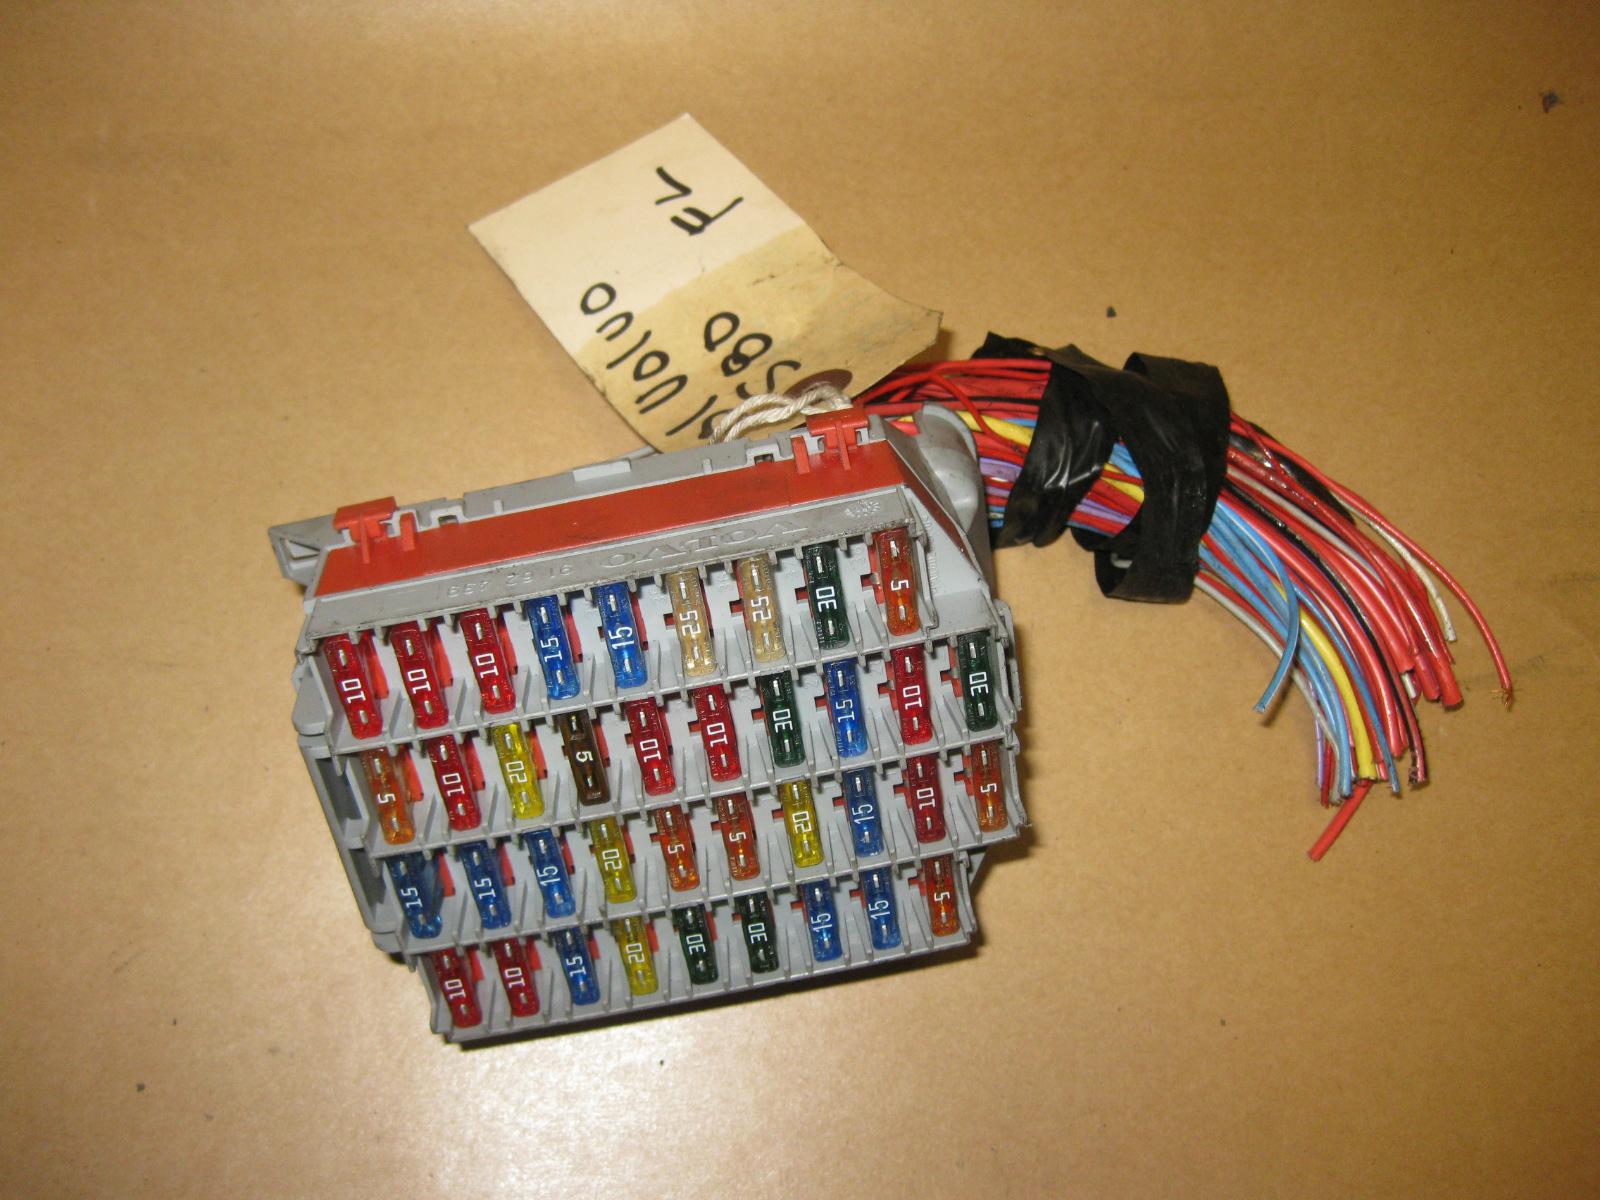 99-03 volvo s80 OEM front L indash fuse box w/ fuses 91 62 439